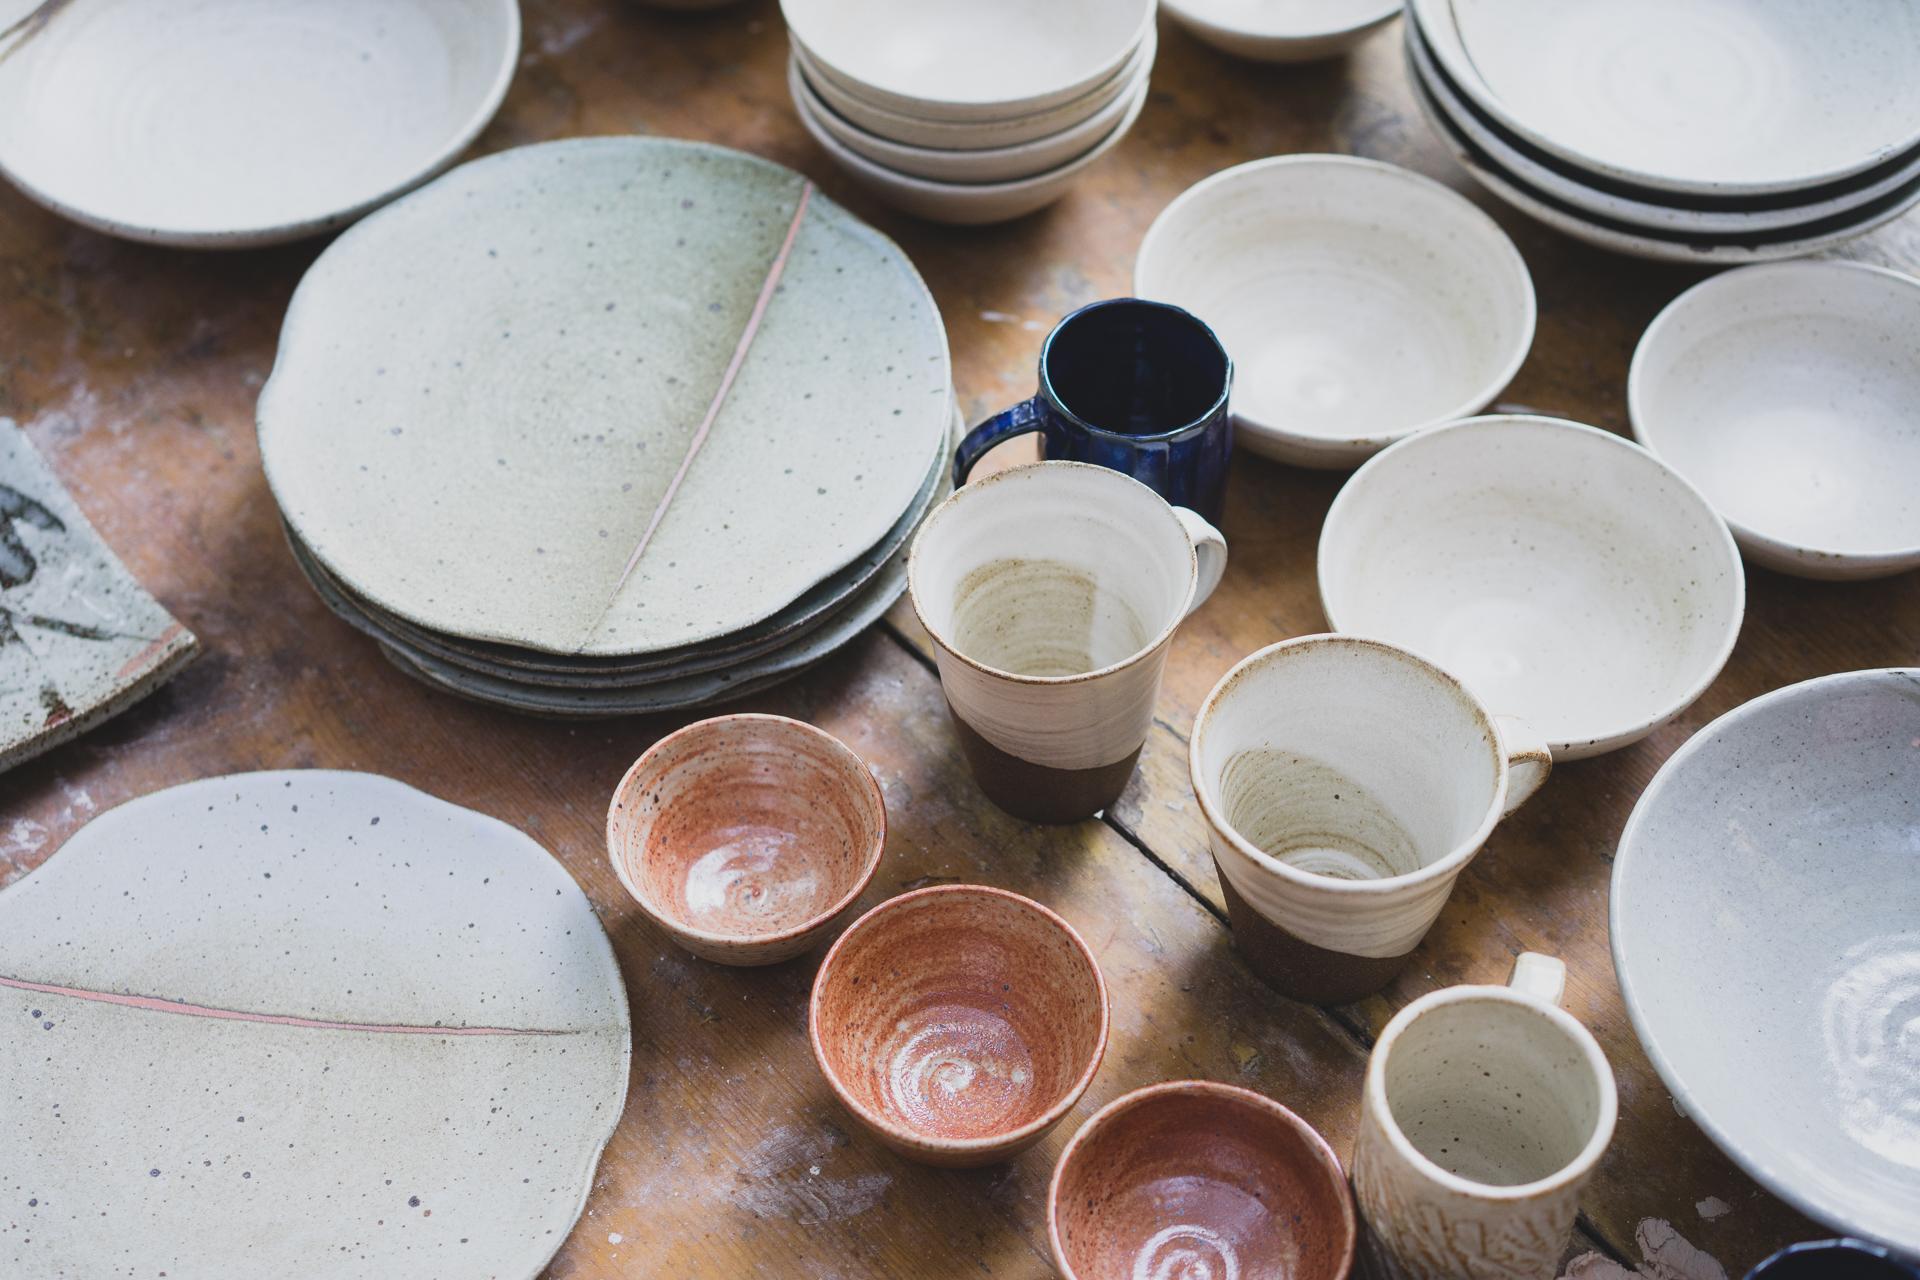 sues-studio-ceramics-kiln-0006.jpg